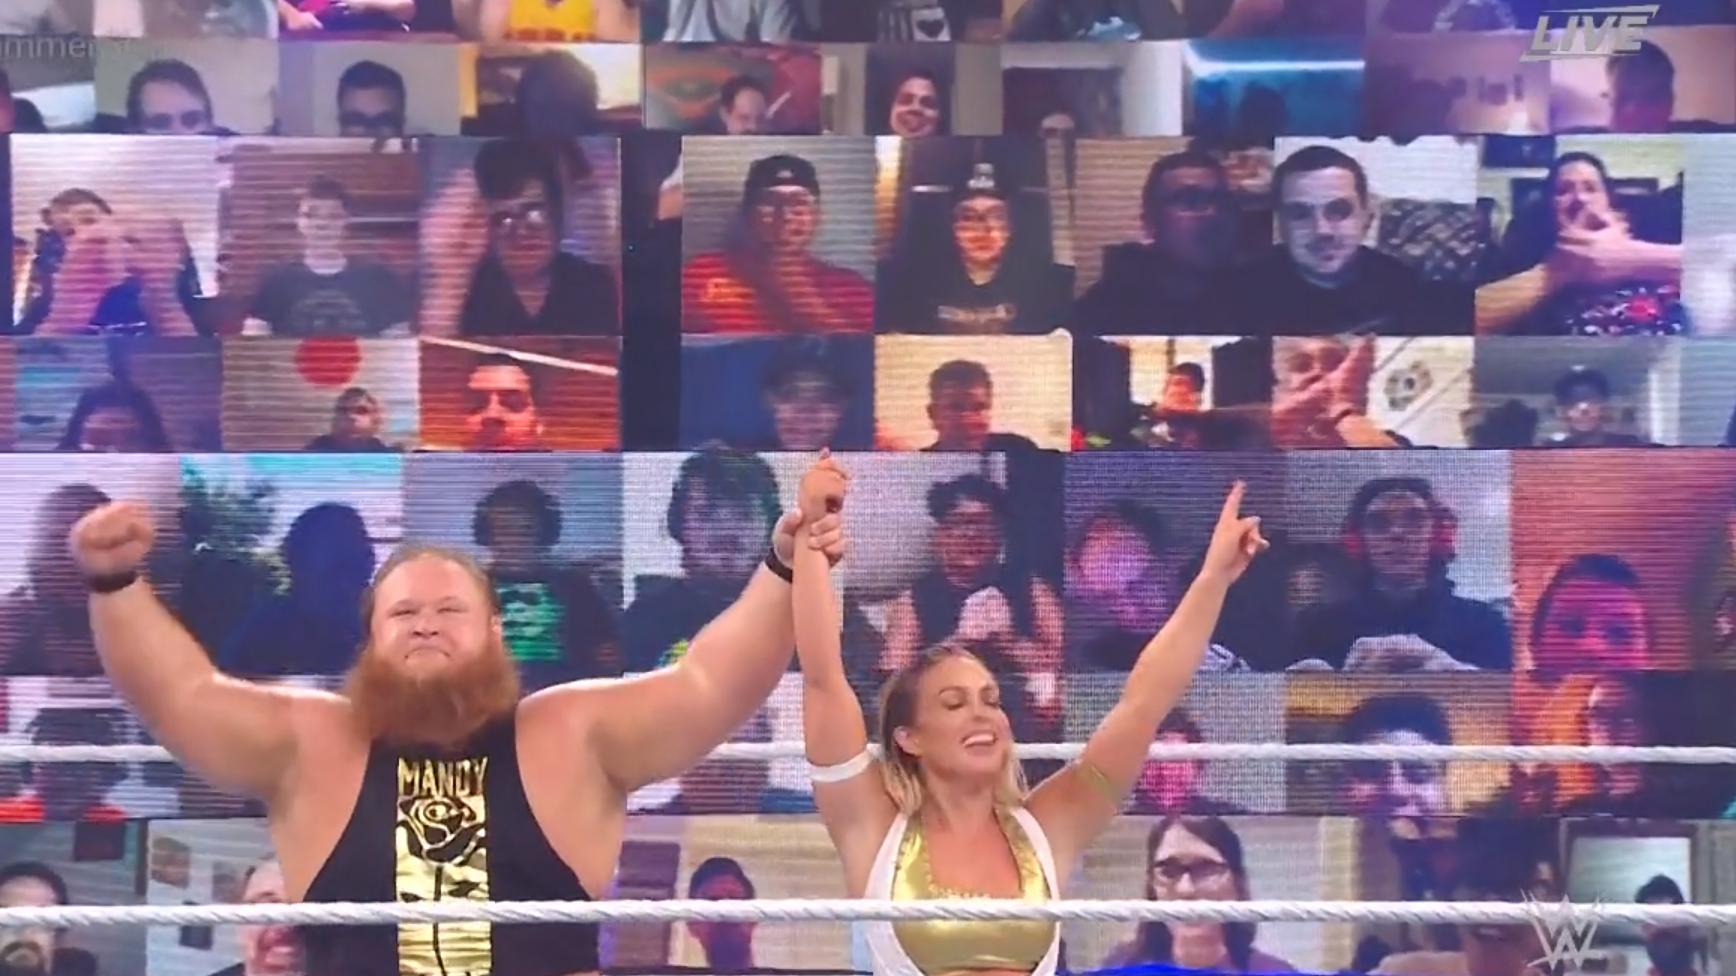 Mandy Rose Defeats Sonya Deville At Summerslam Sonya Must Leave Wwe At Summerslam 2020 Mandy Rose Defeated Sonya Via Www Figh Summerslam Wwe Wwe Summerslam